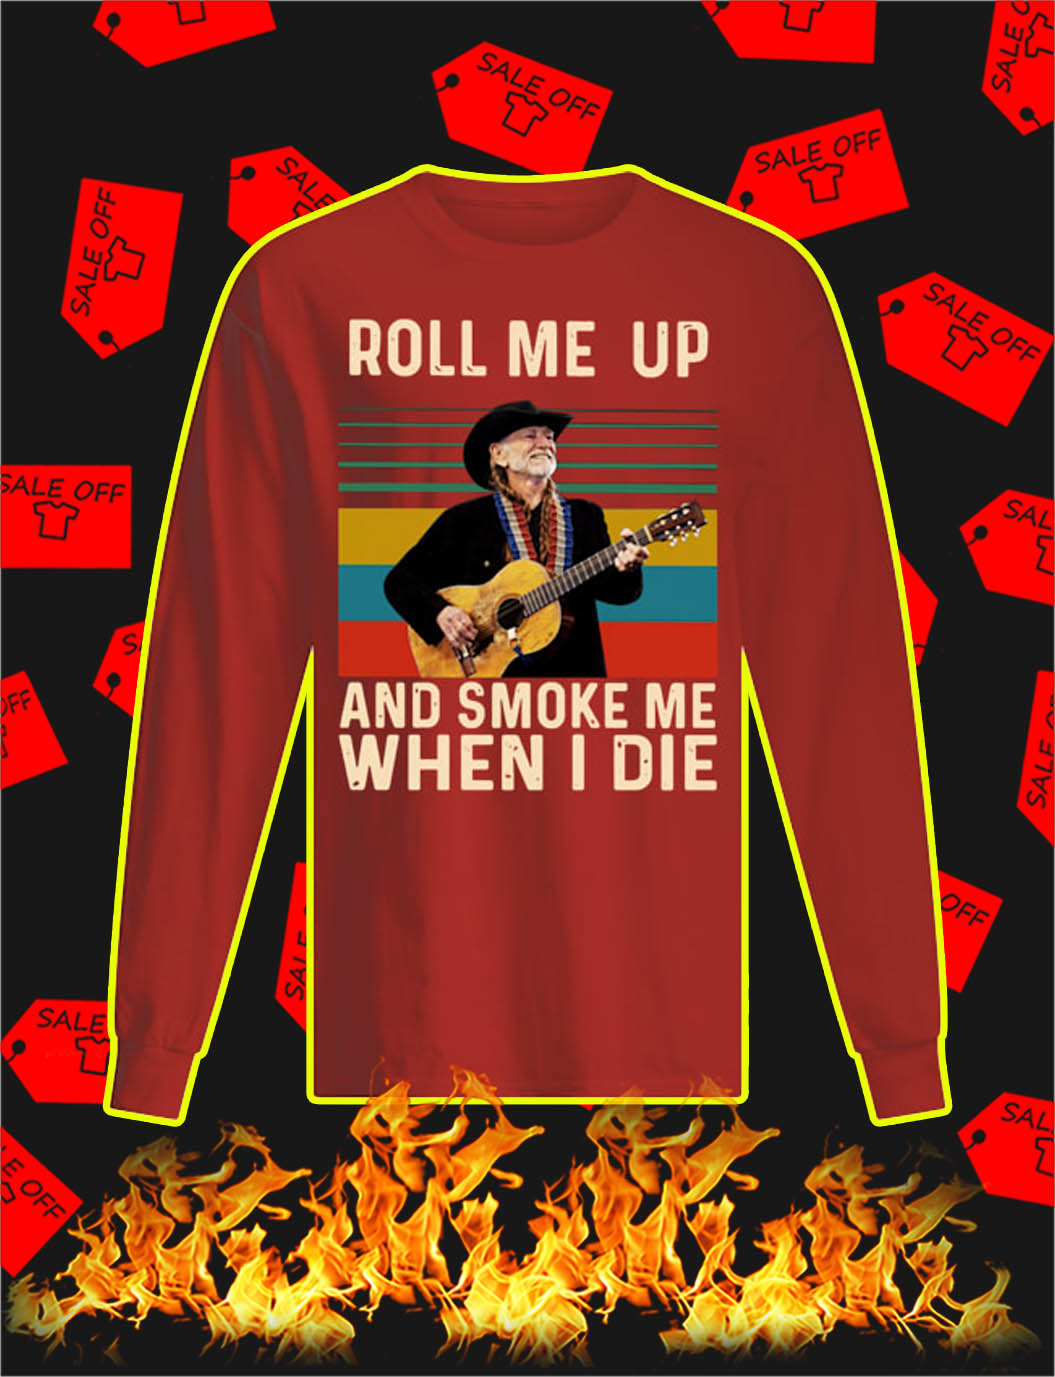 Roll Me Up And Smoke Me When I Die longsleeve tee